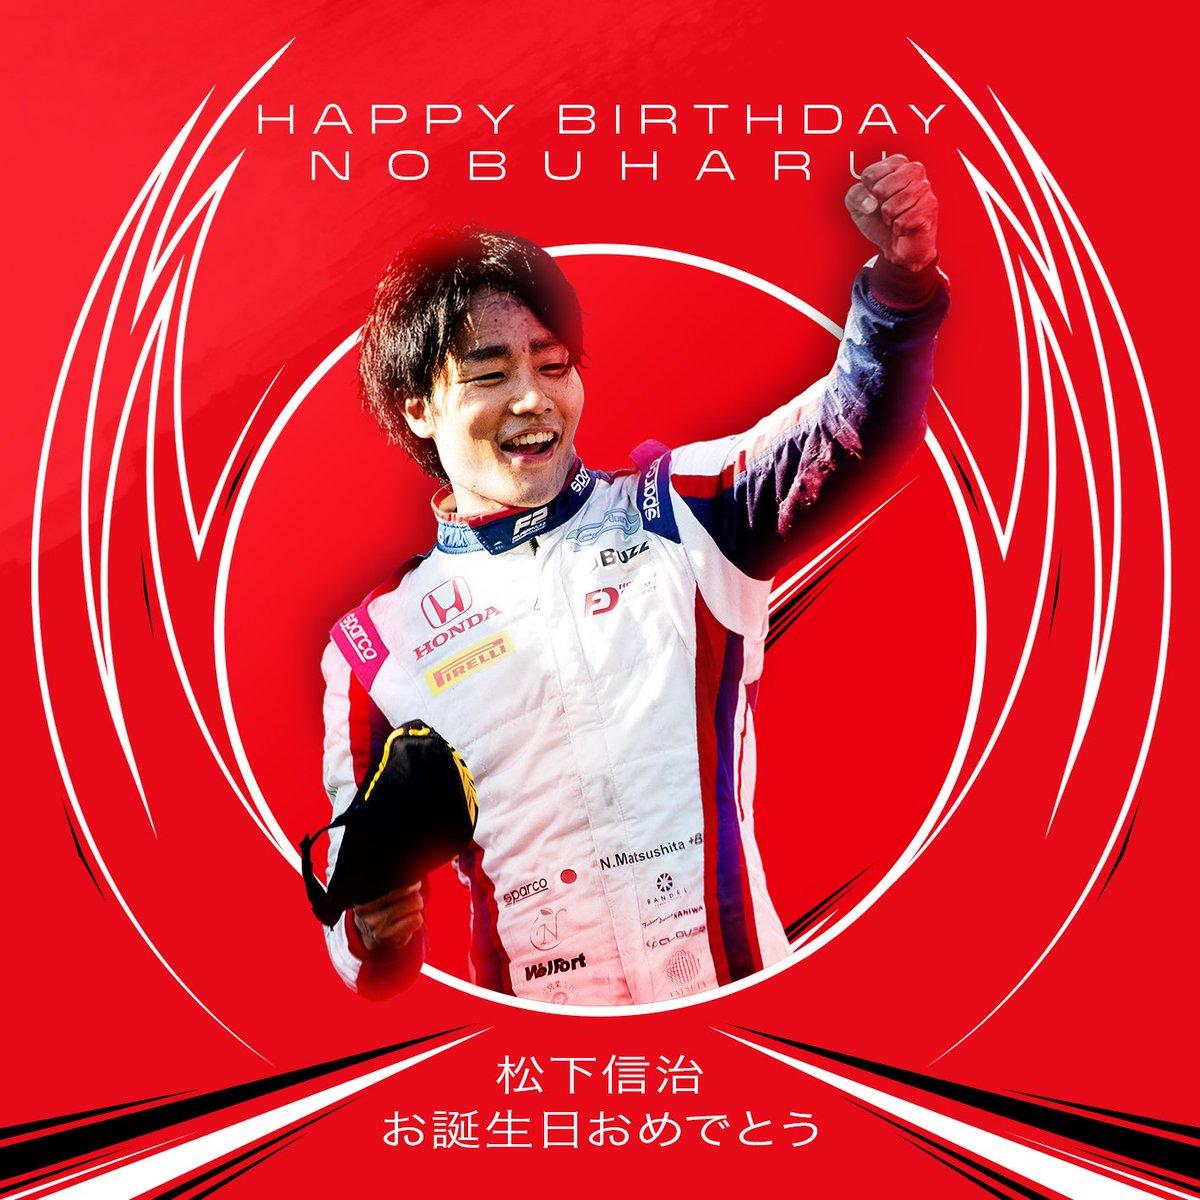 Belated happy birthday to @Nobu_Mat13! 🎉  Our race winner turned 2️⃣6️⃣ 🙌  #RoadToF1 #F2